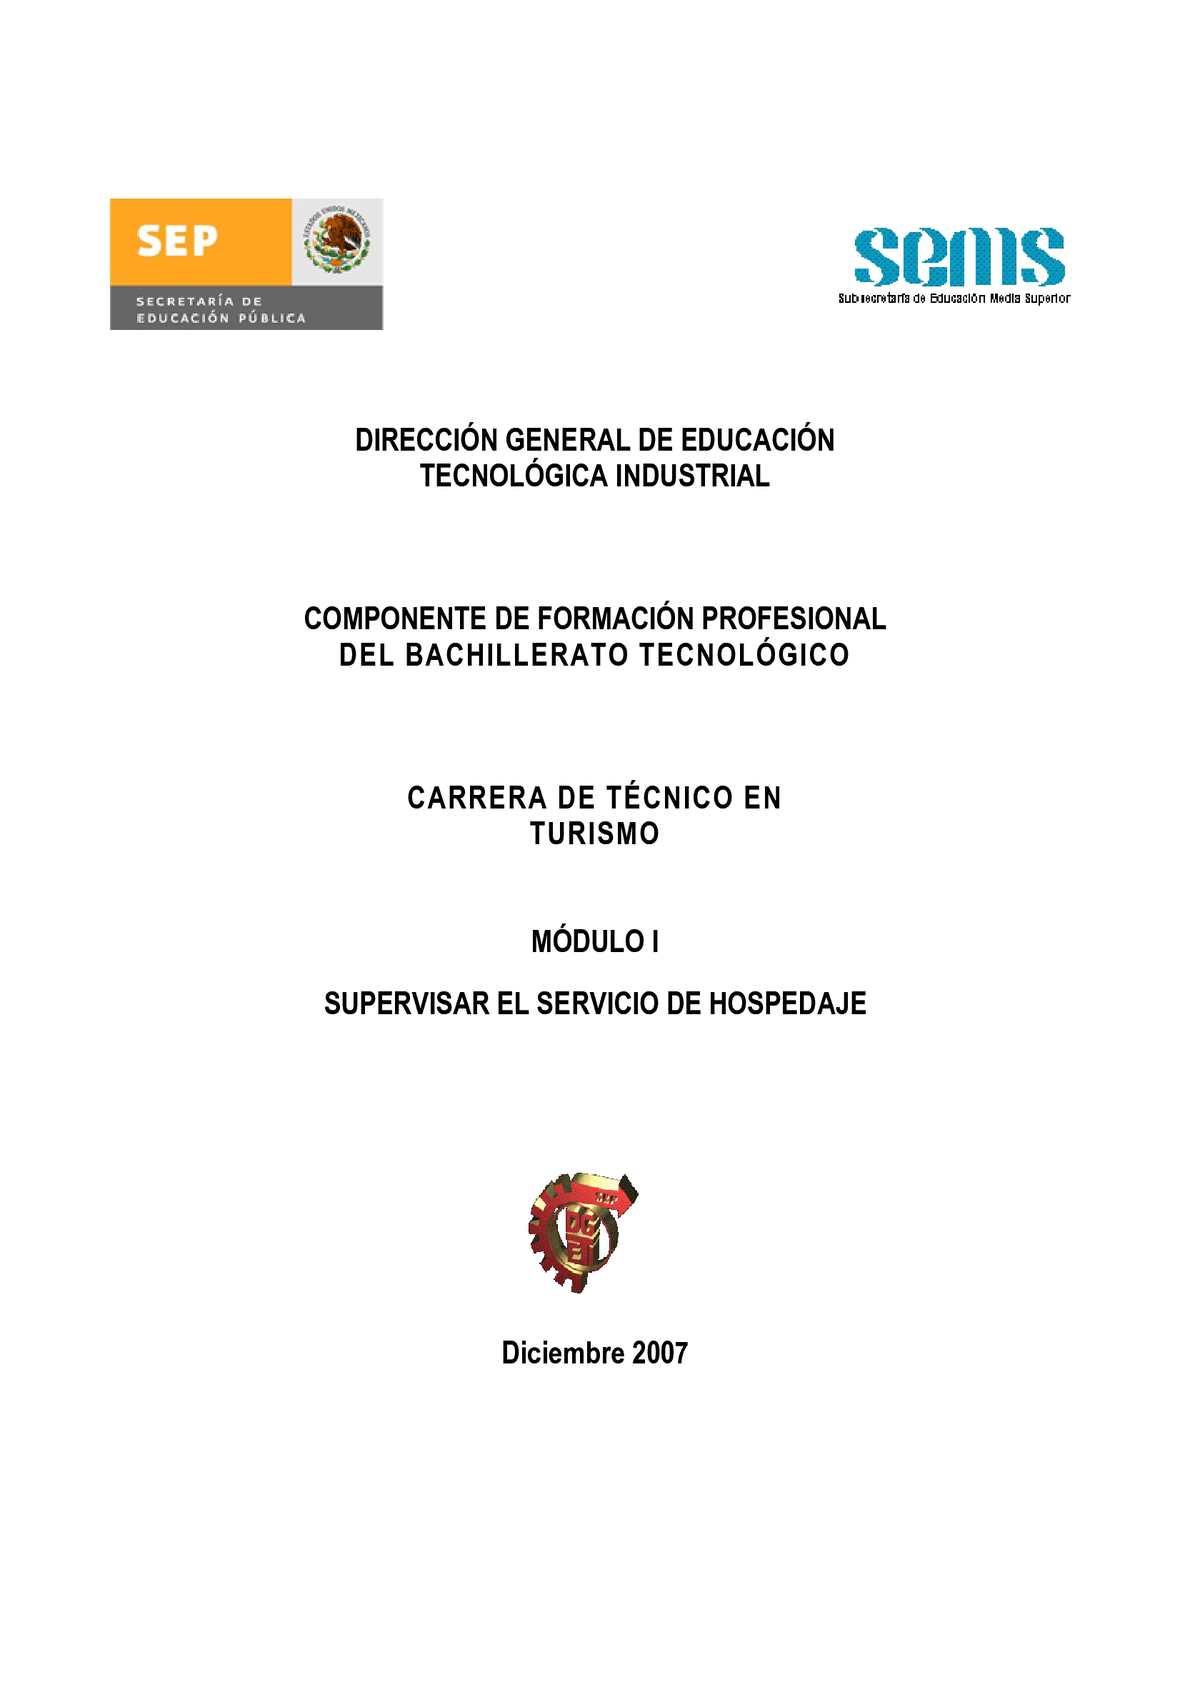 Calaméo - Módulo I Supervisar el servicio de hospedaje